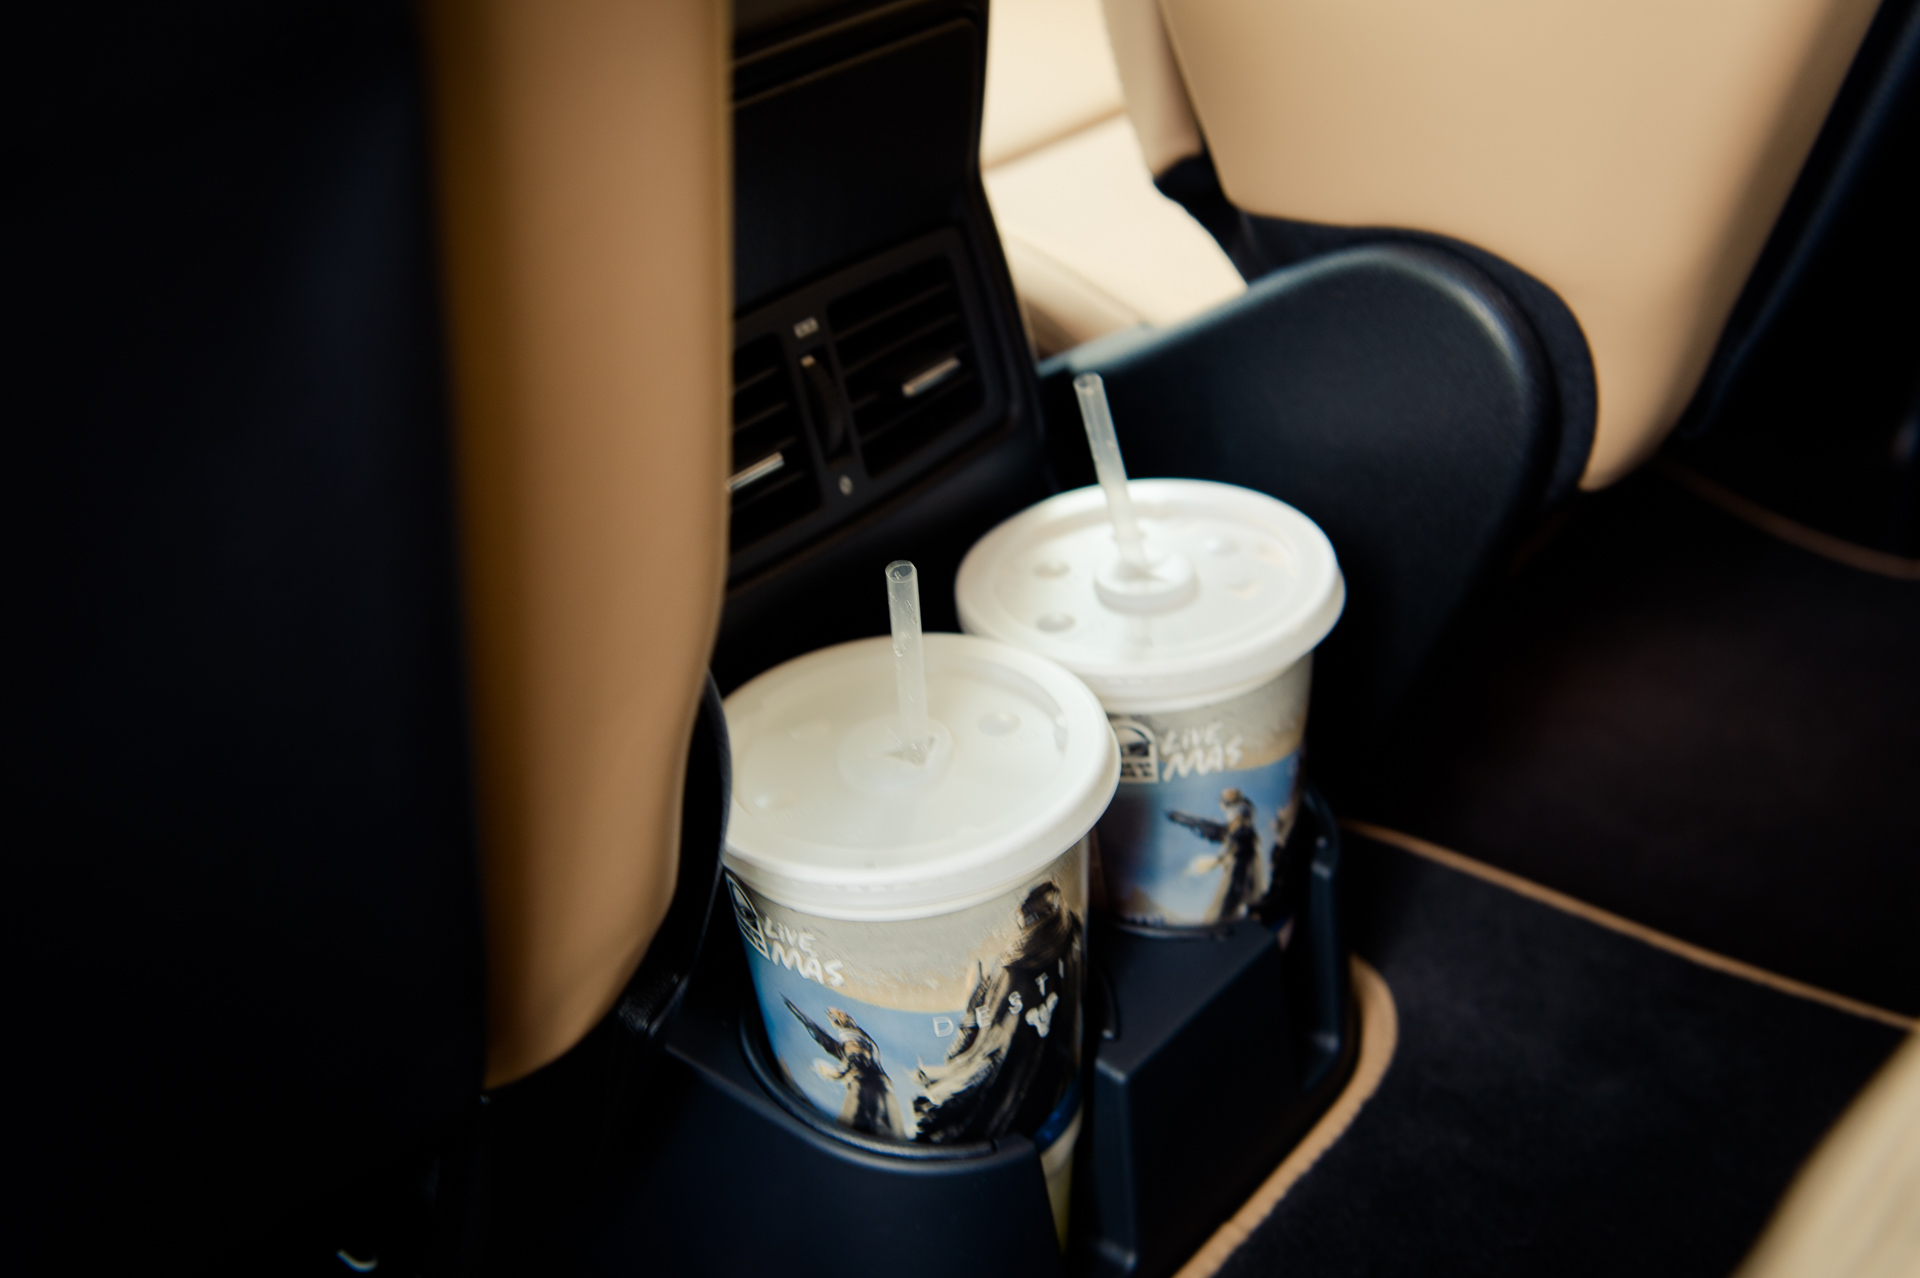 2014-Mercedes-Benz-G500-G550-braun-Kalifornien-mbrt14-39